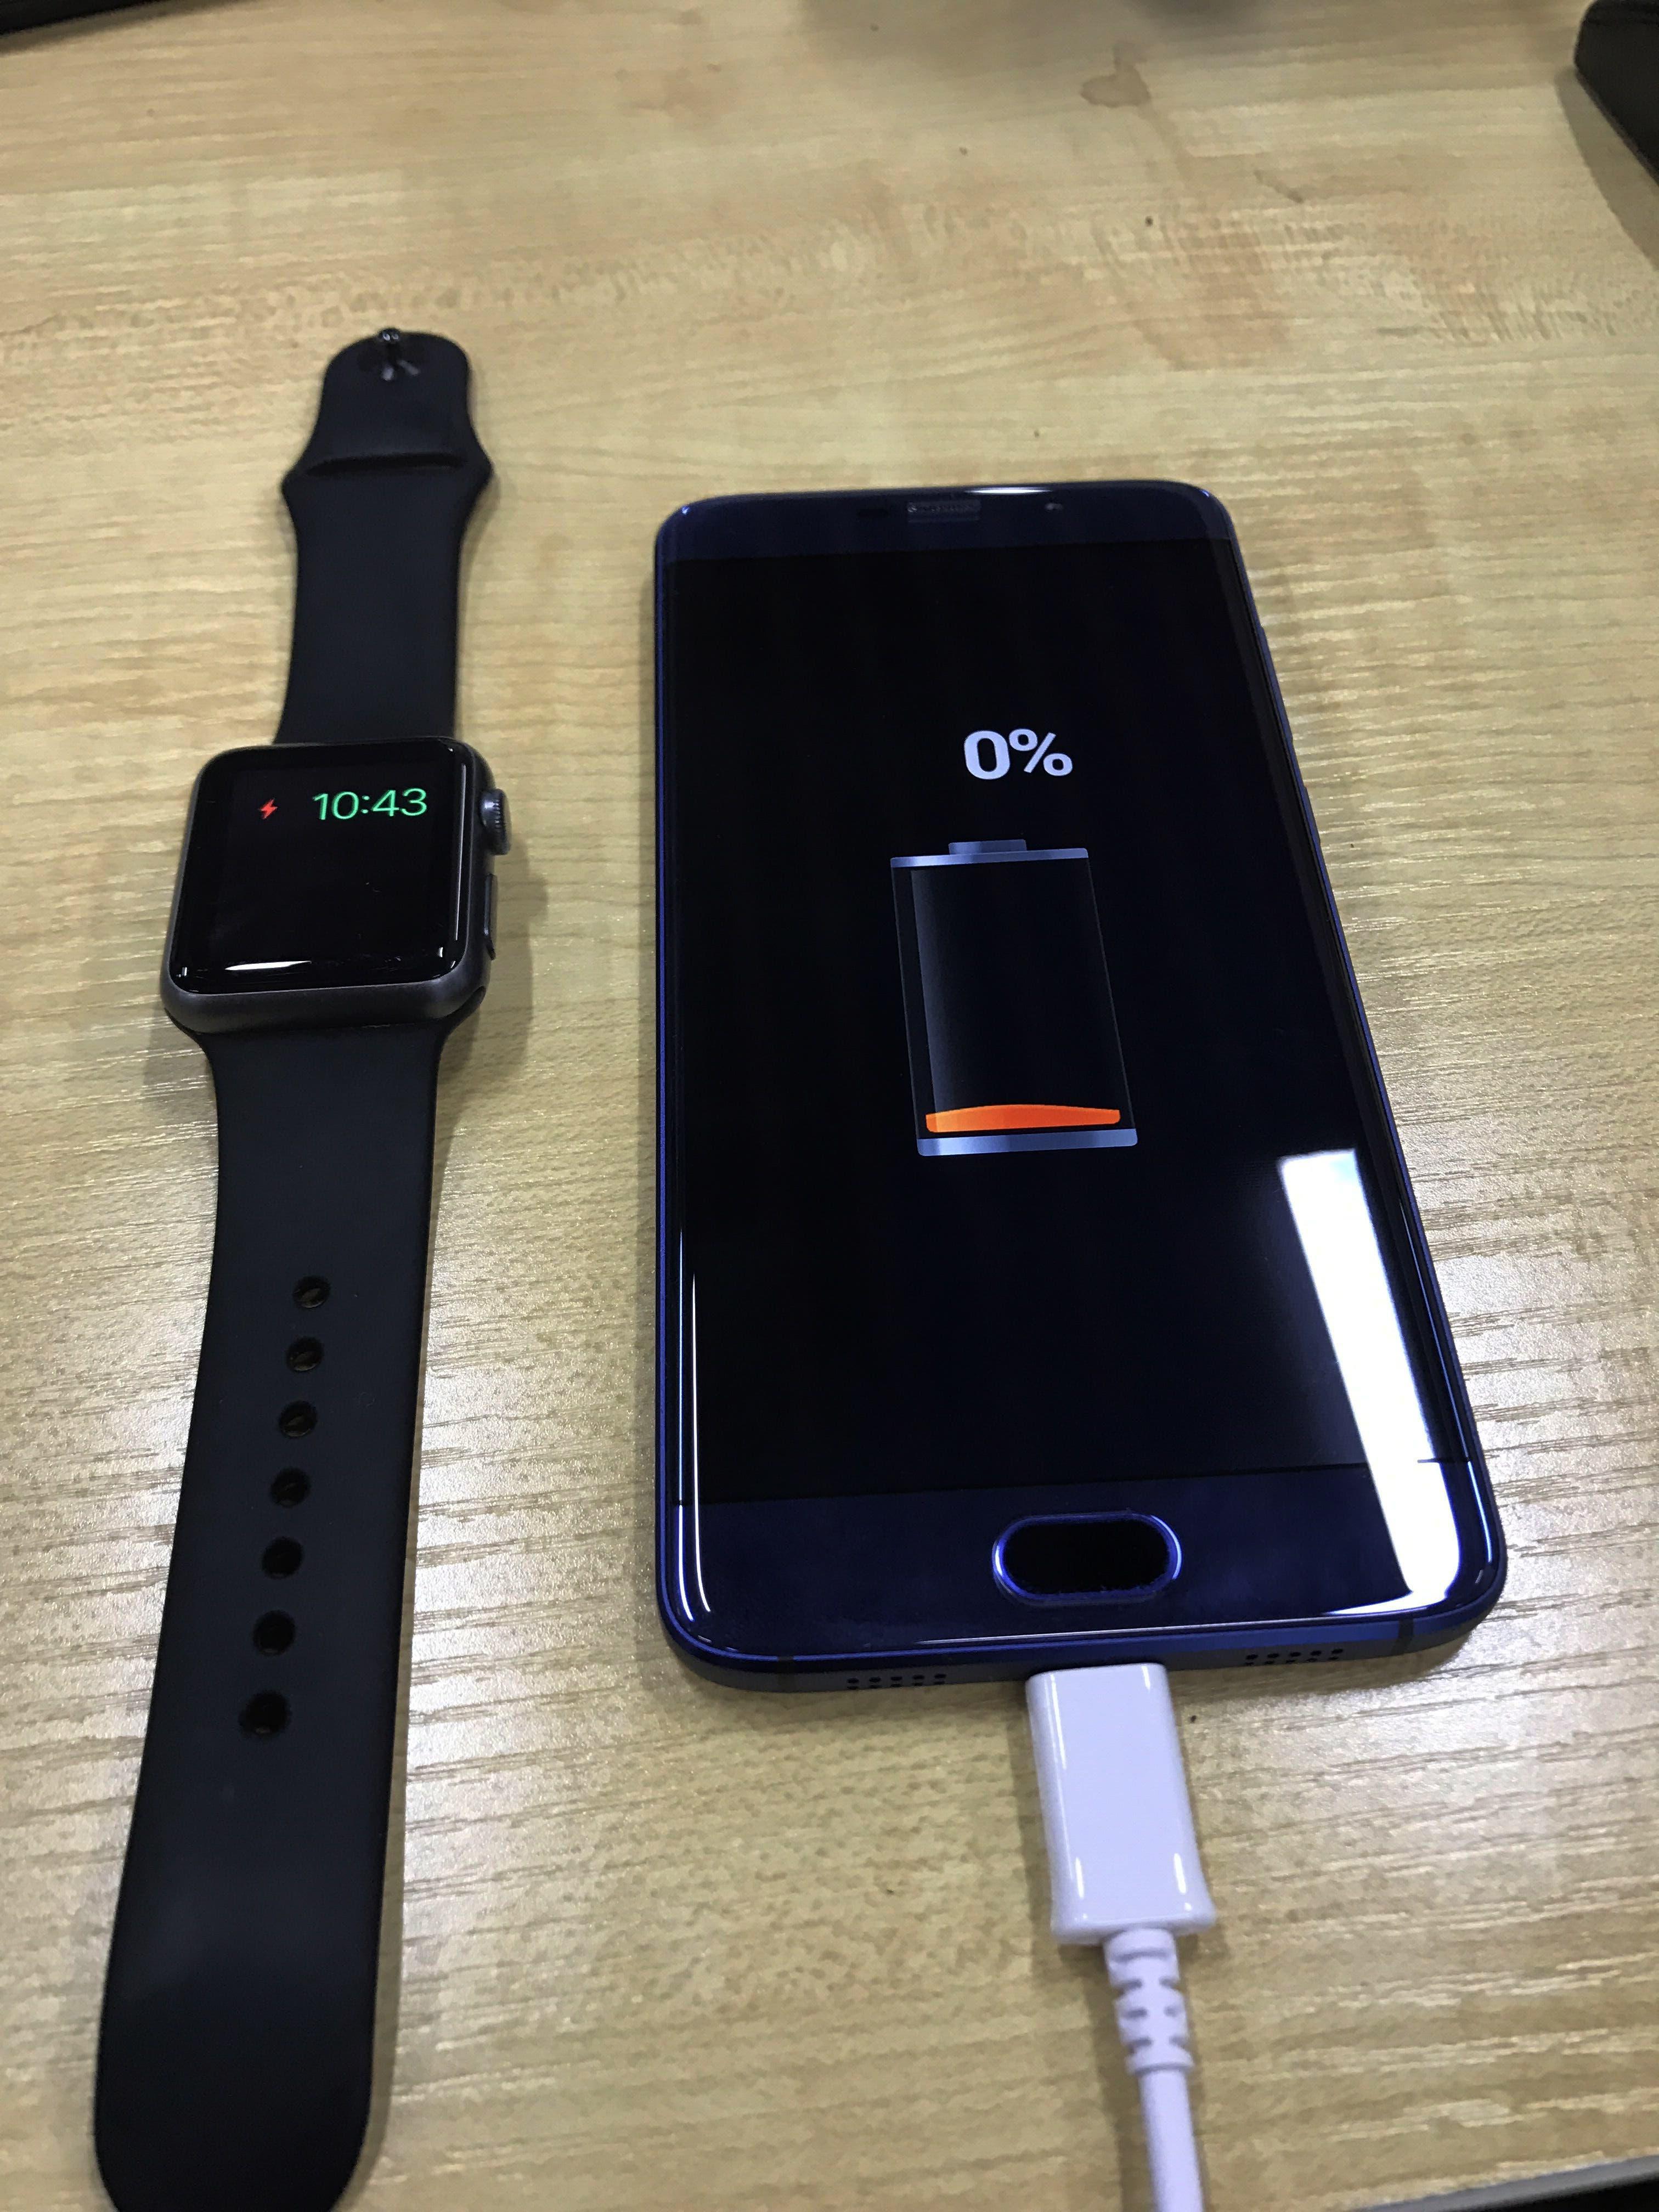 elephone s7 charging